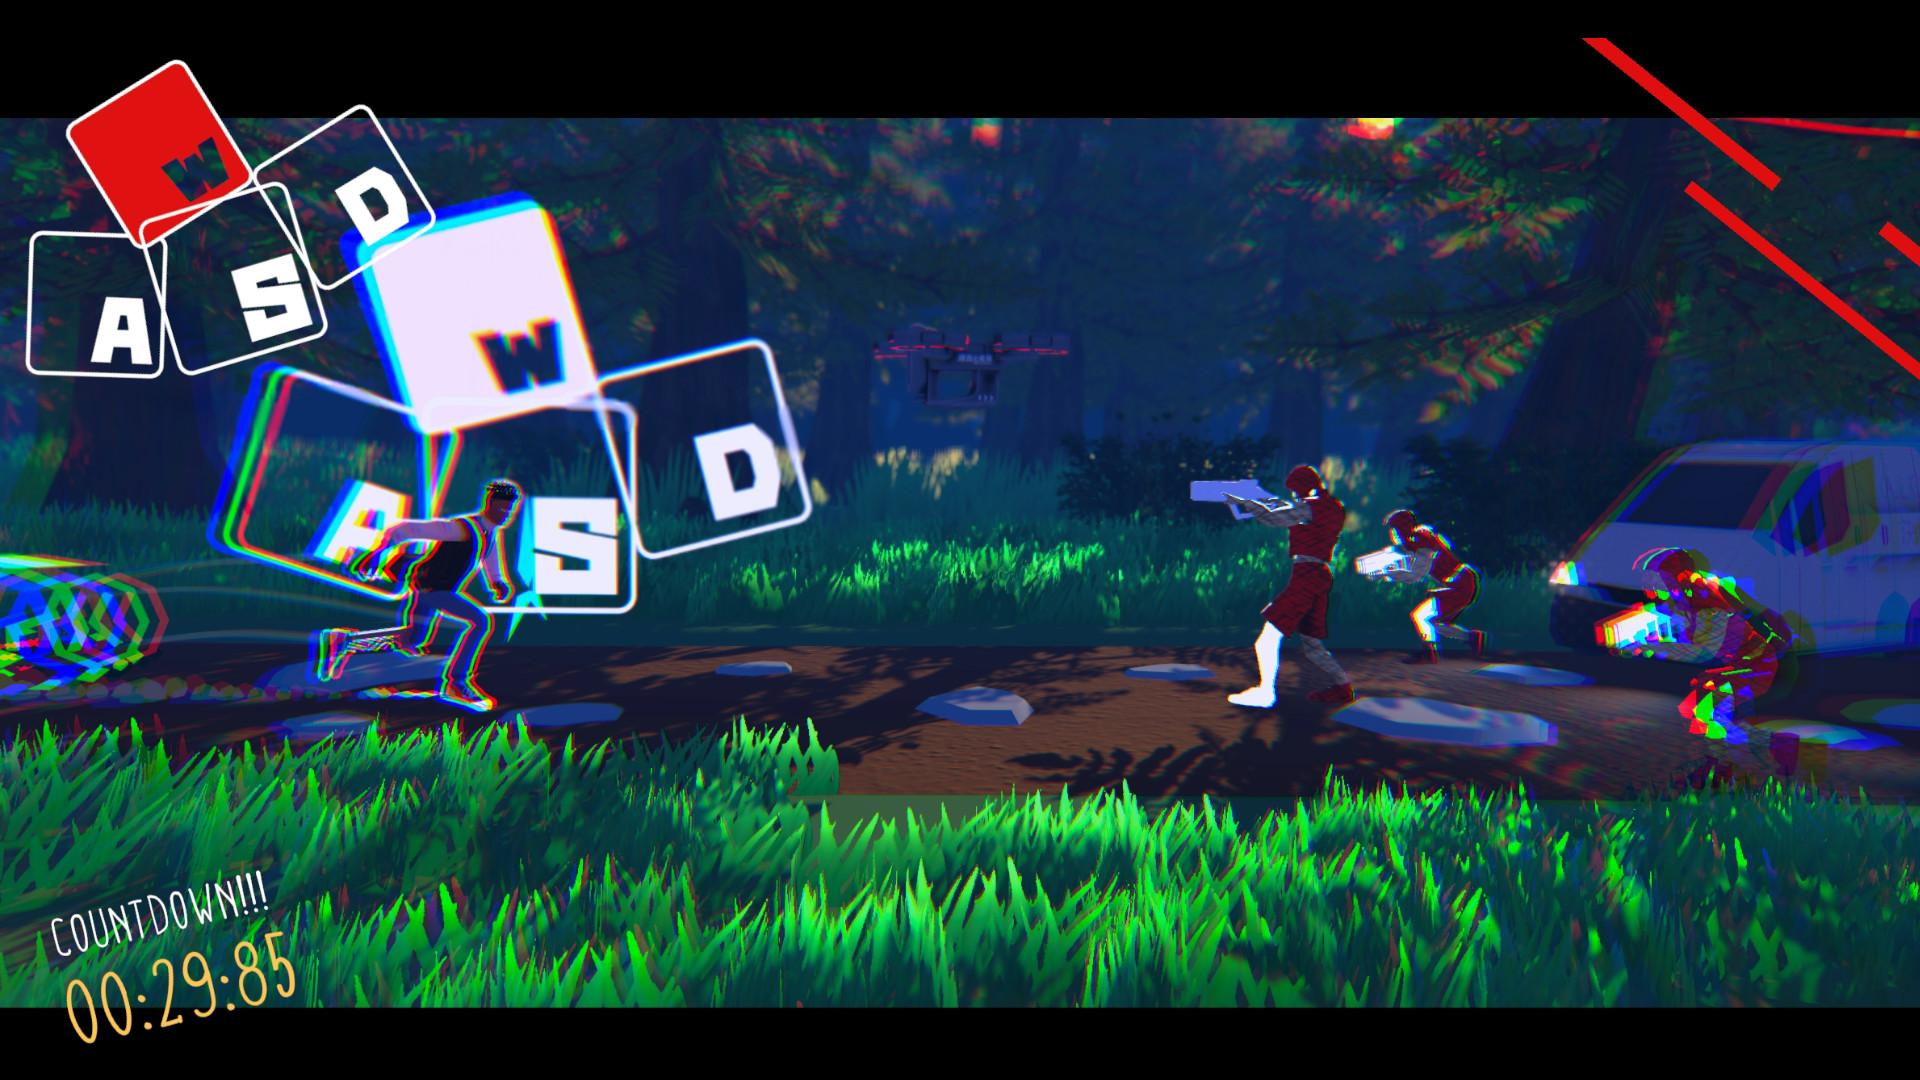 How a Solo Developer from Detroit Landed in Nintendo's Spotlight